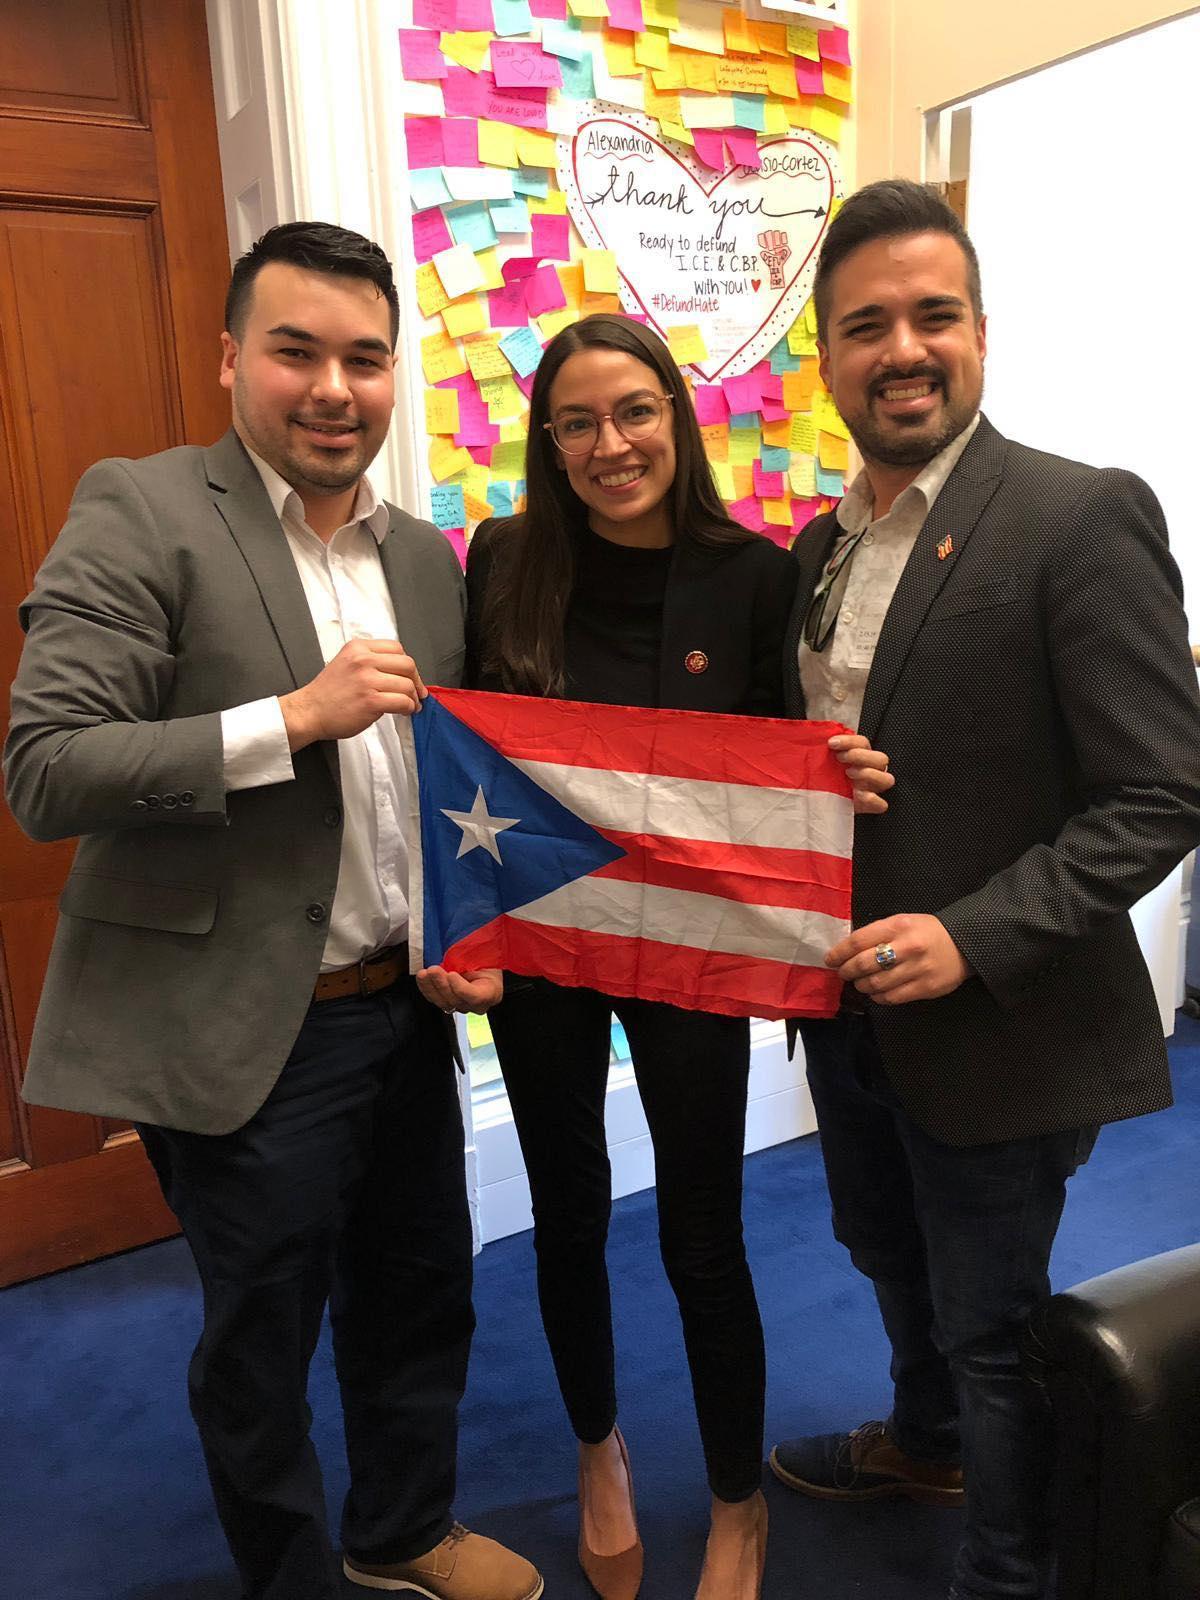 Visiting the office of Congresswoman Alexandria Ocasio-Cortez